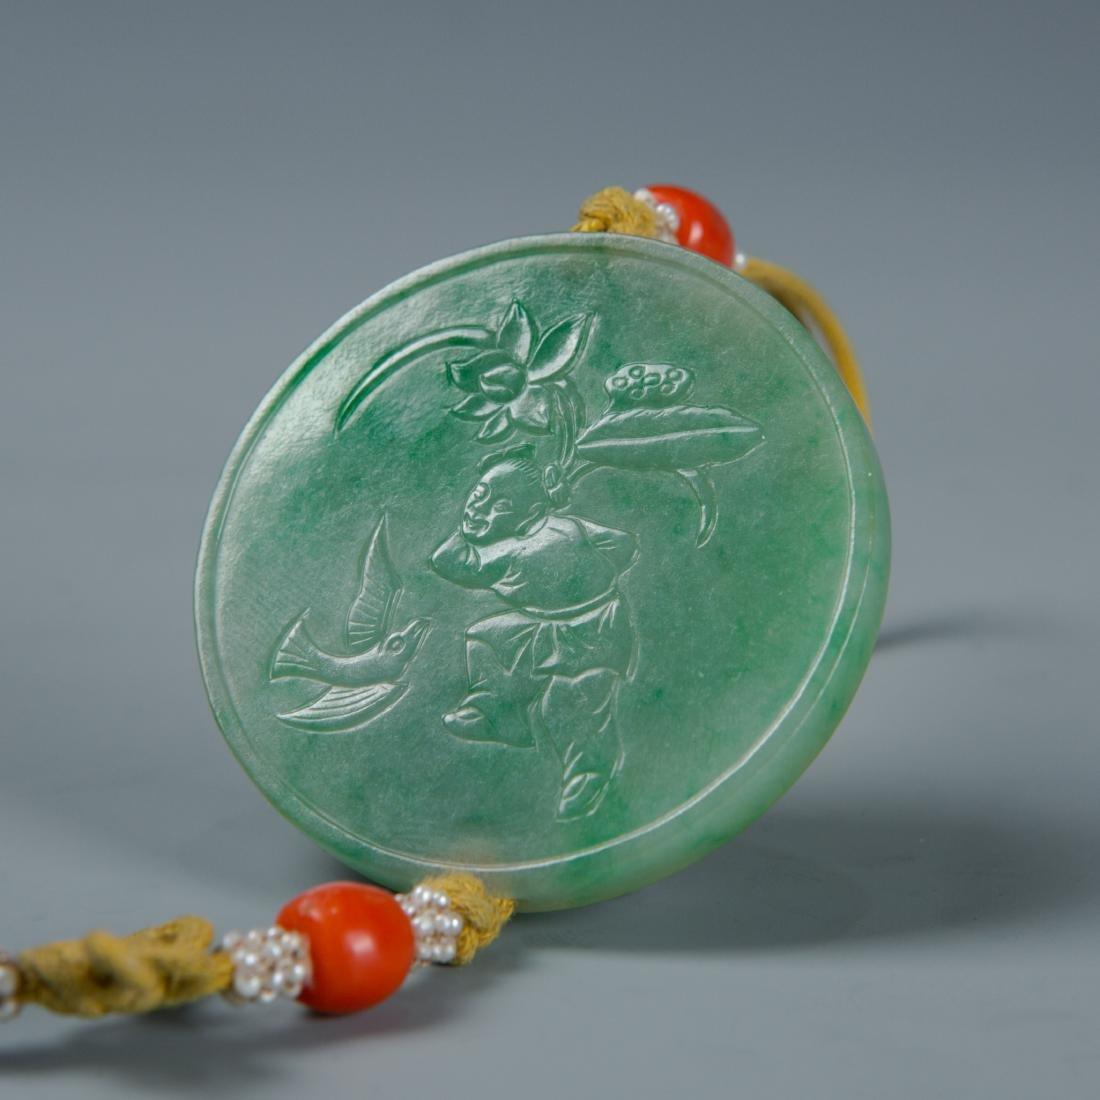 Jadeite disk on lanyard with tassel - 5